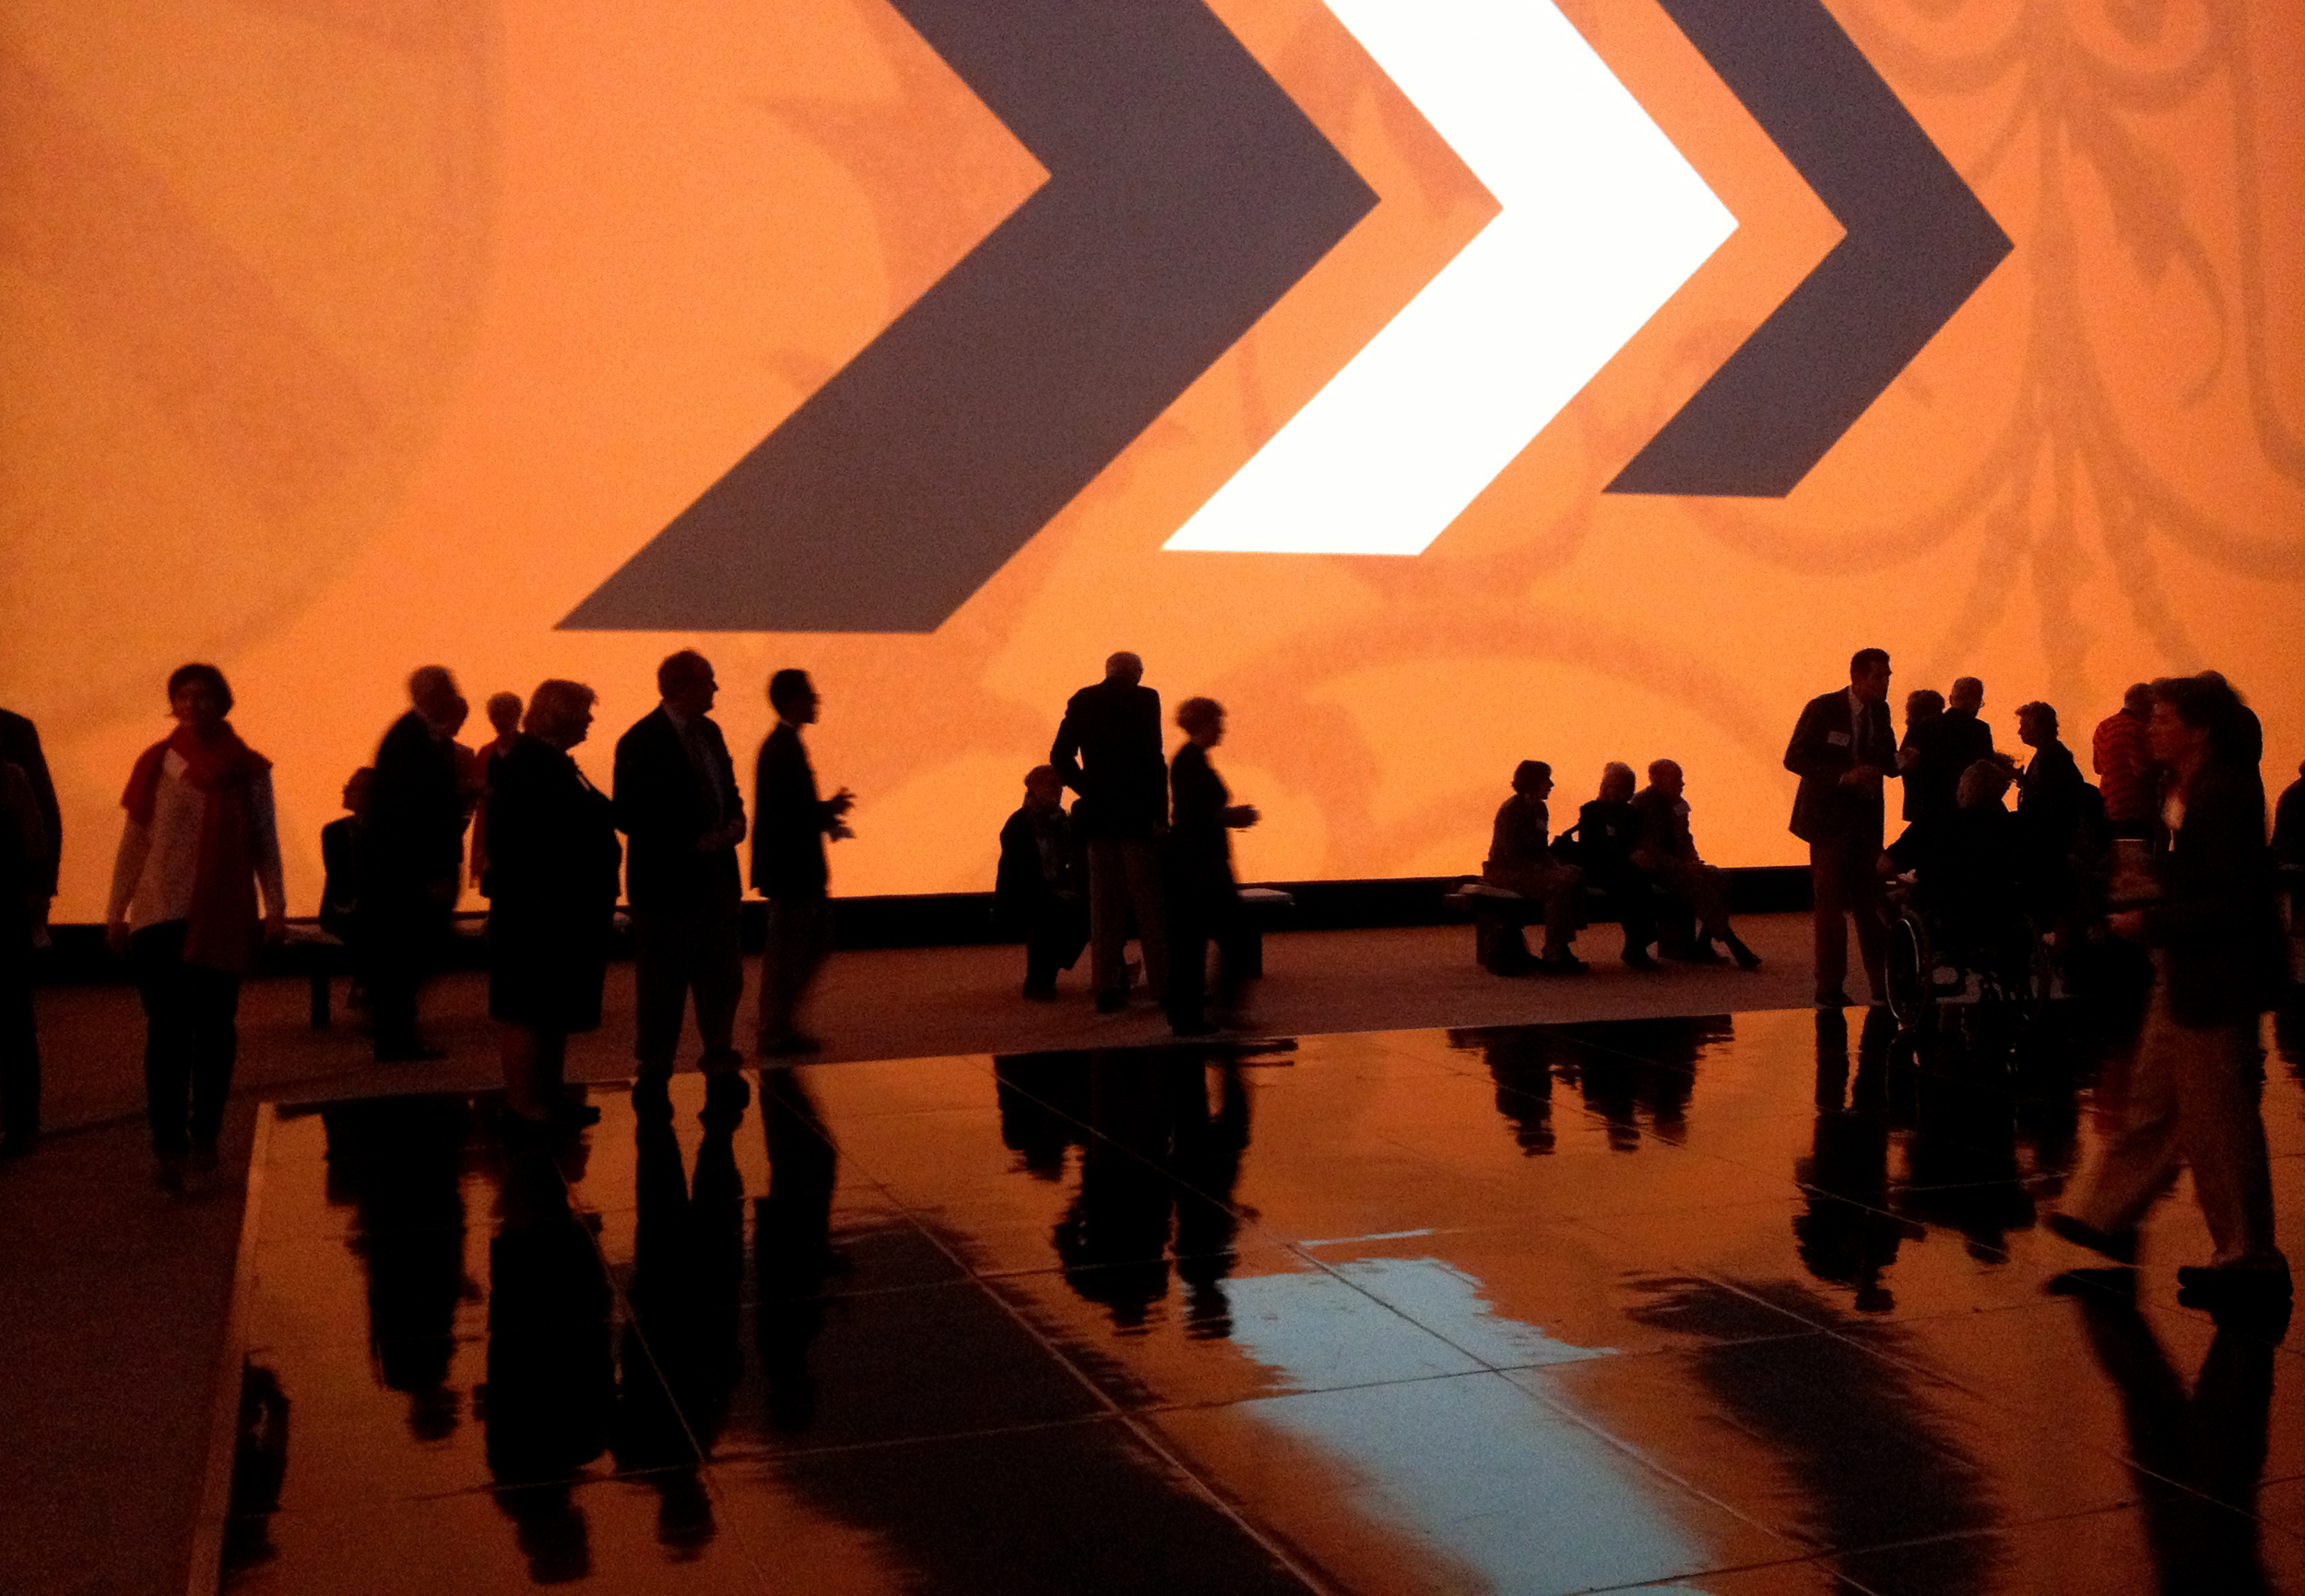 princeton-university-aspire-event-design-03.jpg